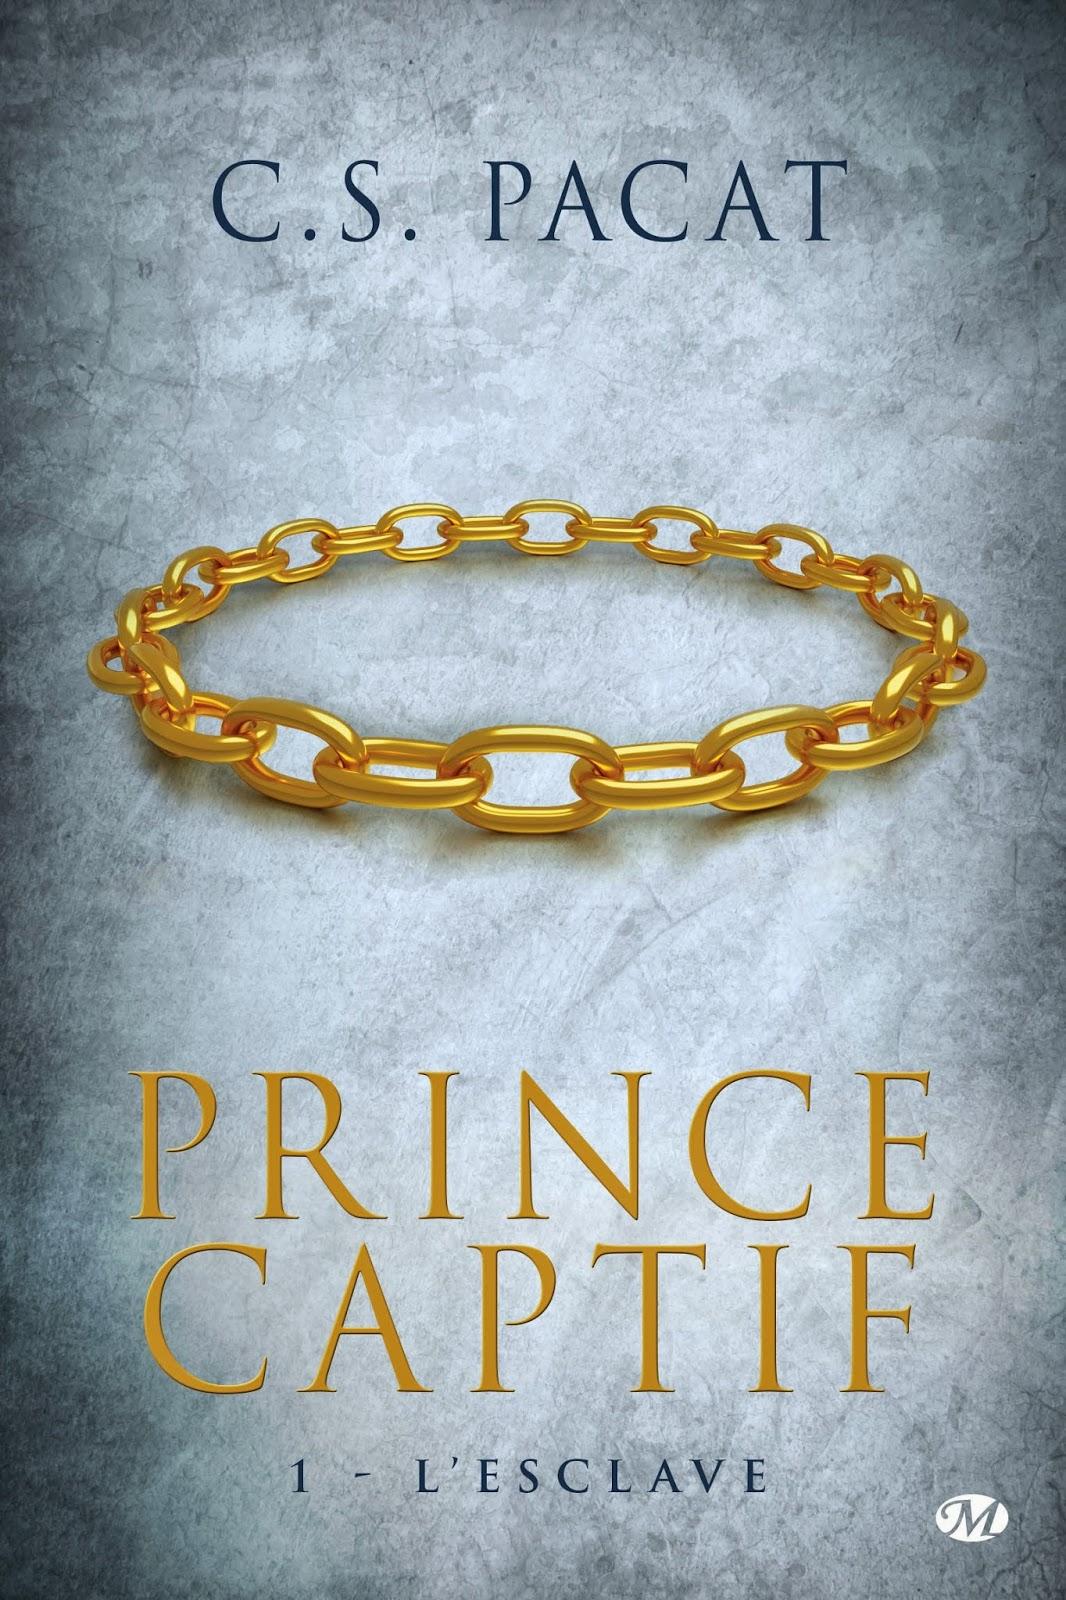 Pacat, CS - Prince Captif T1